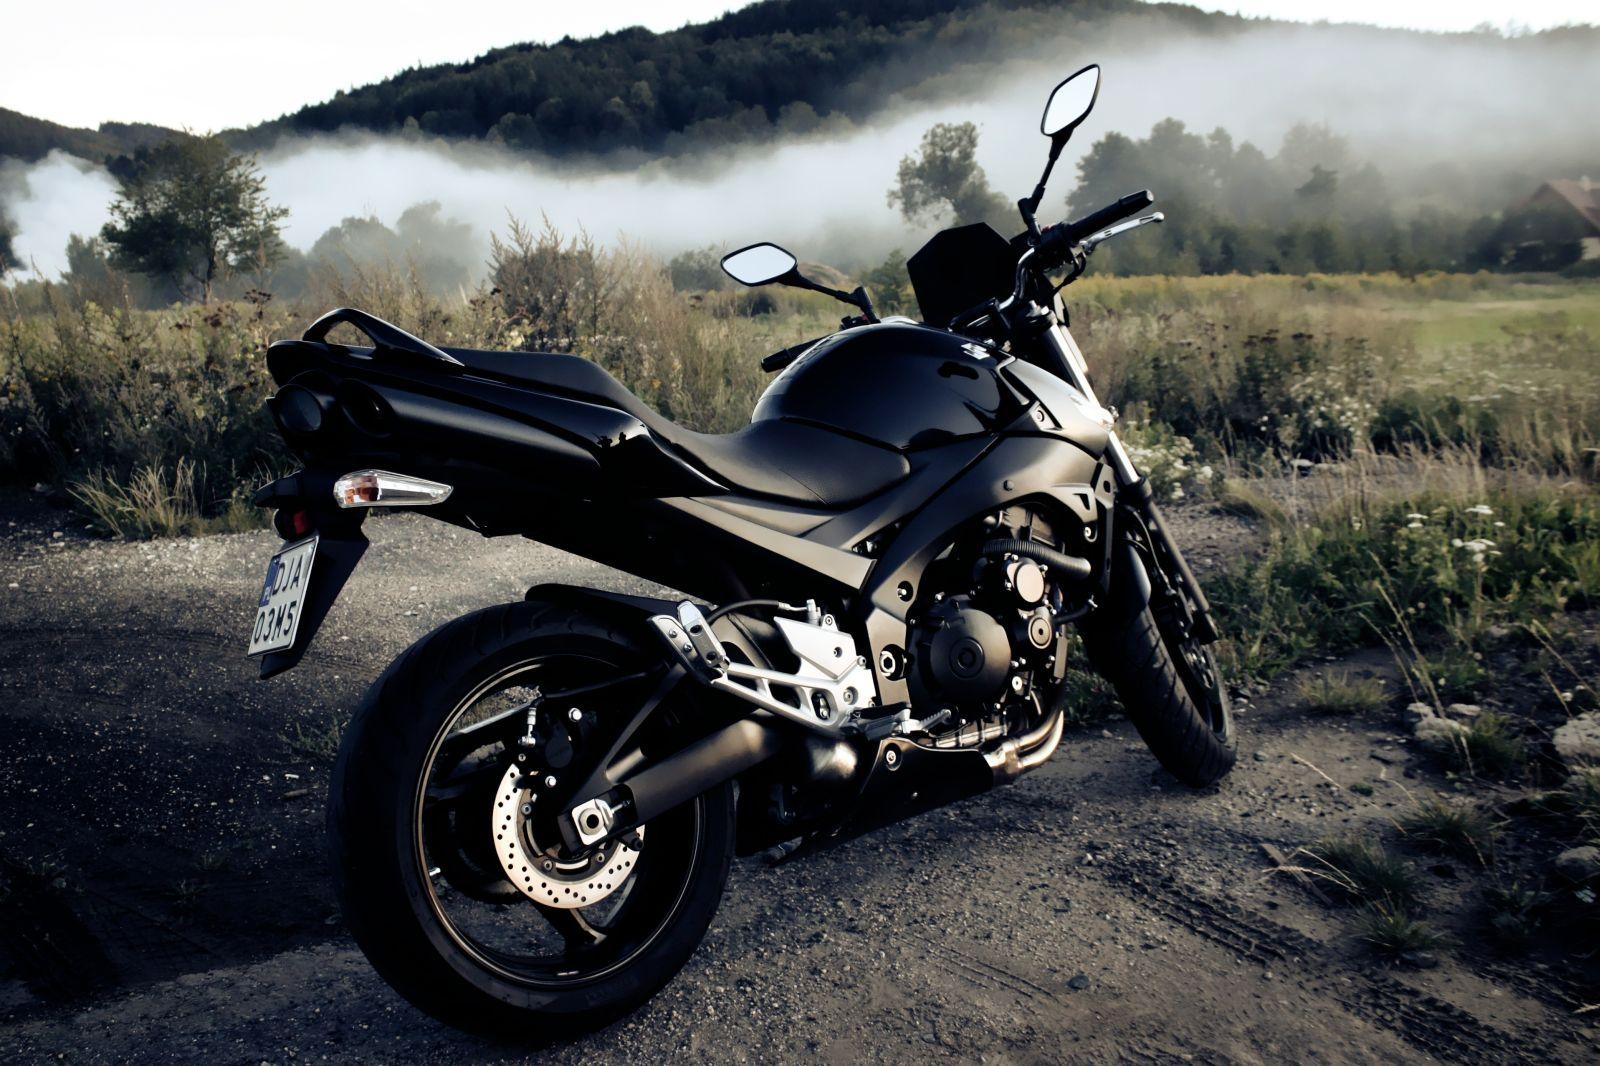 Жизнь на мотоцикле